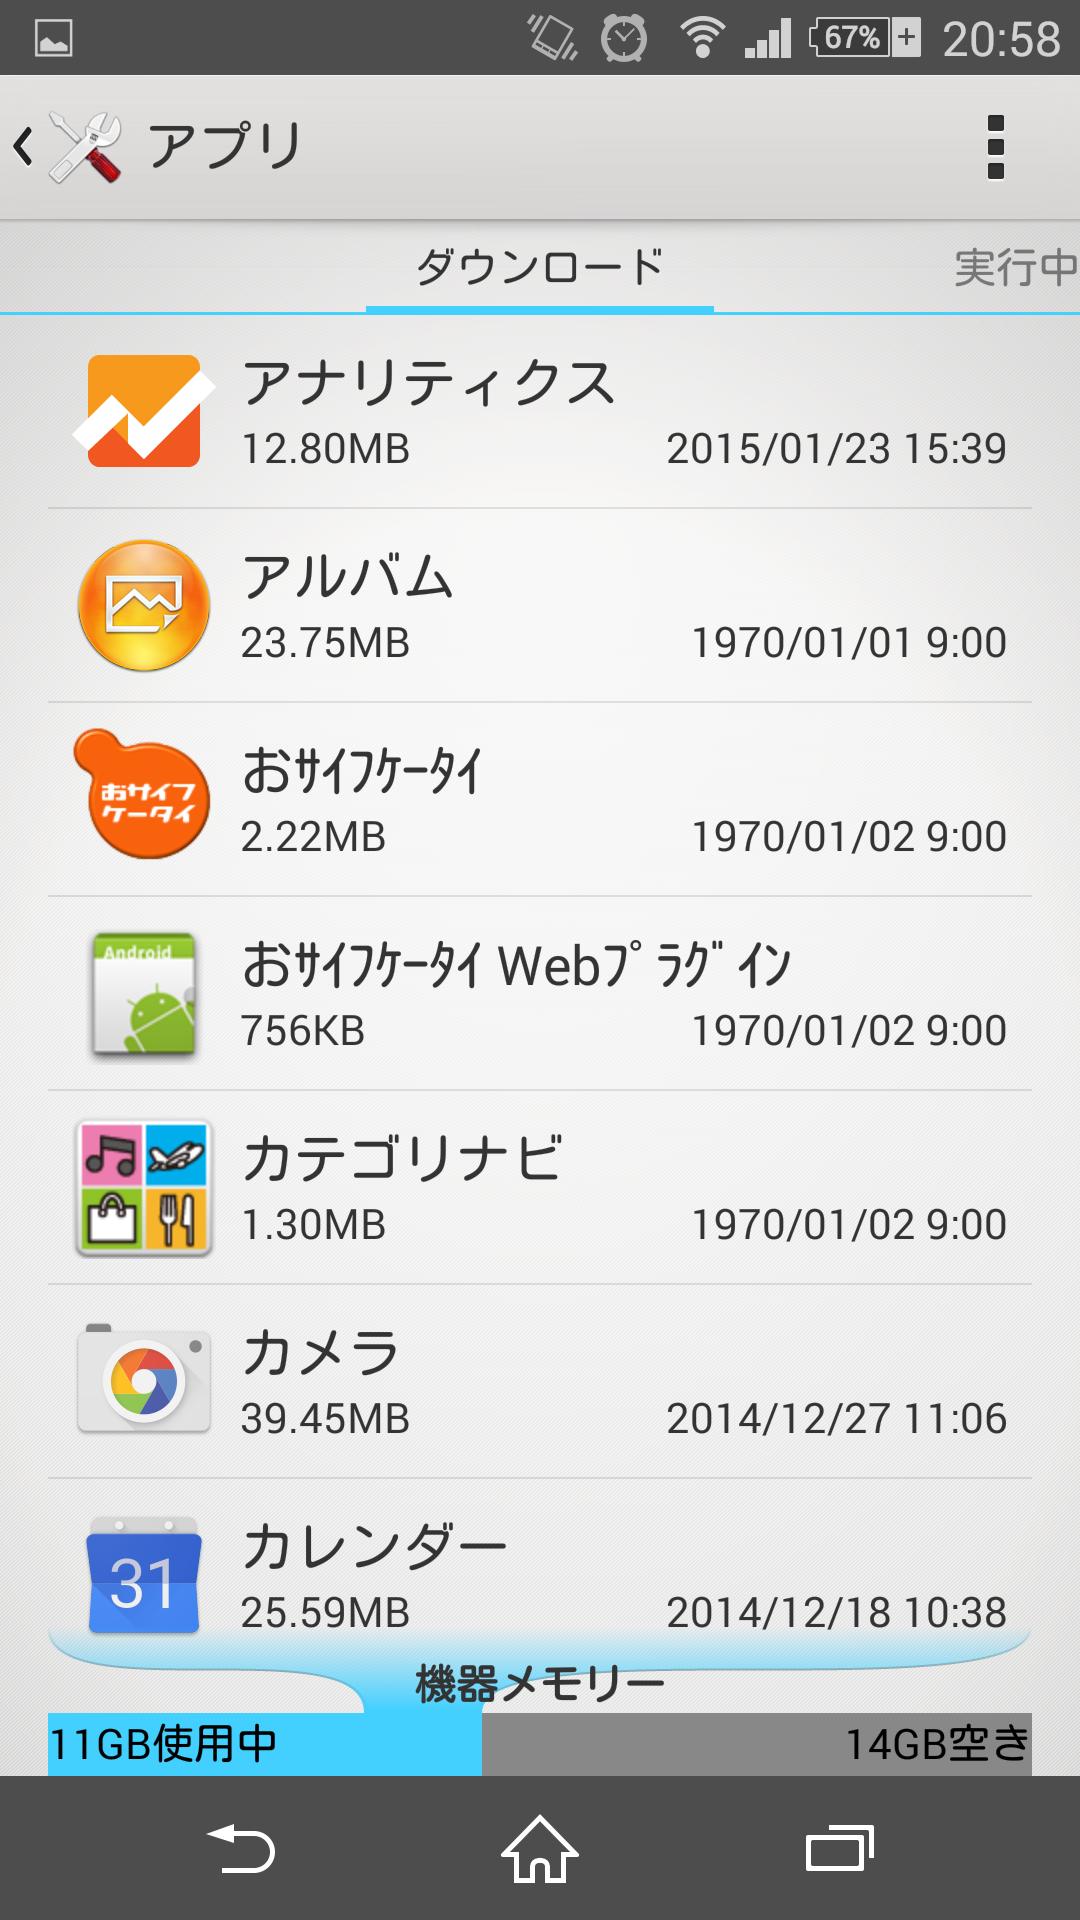 Screenshot_2015-02-05-20-58-09